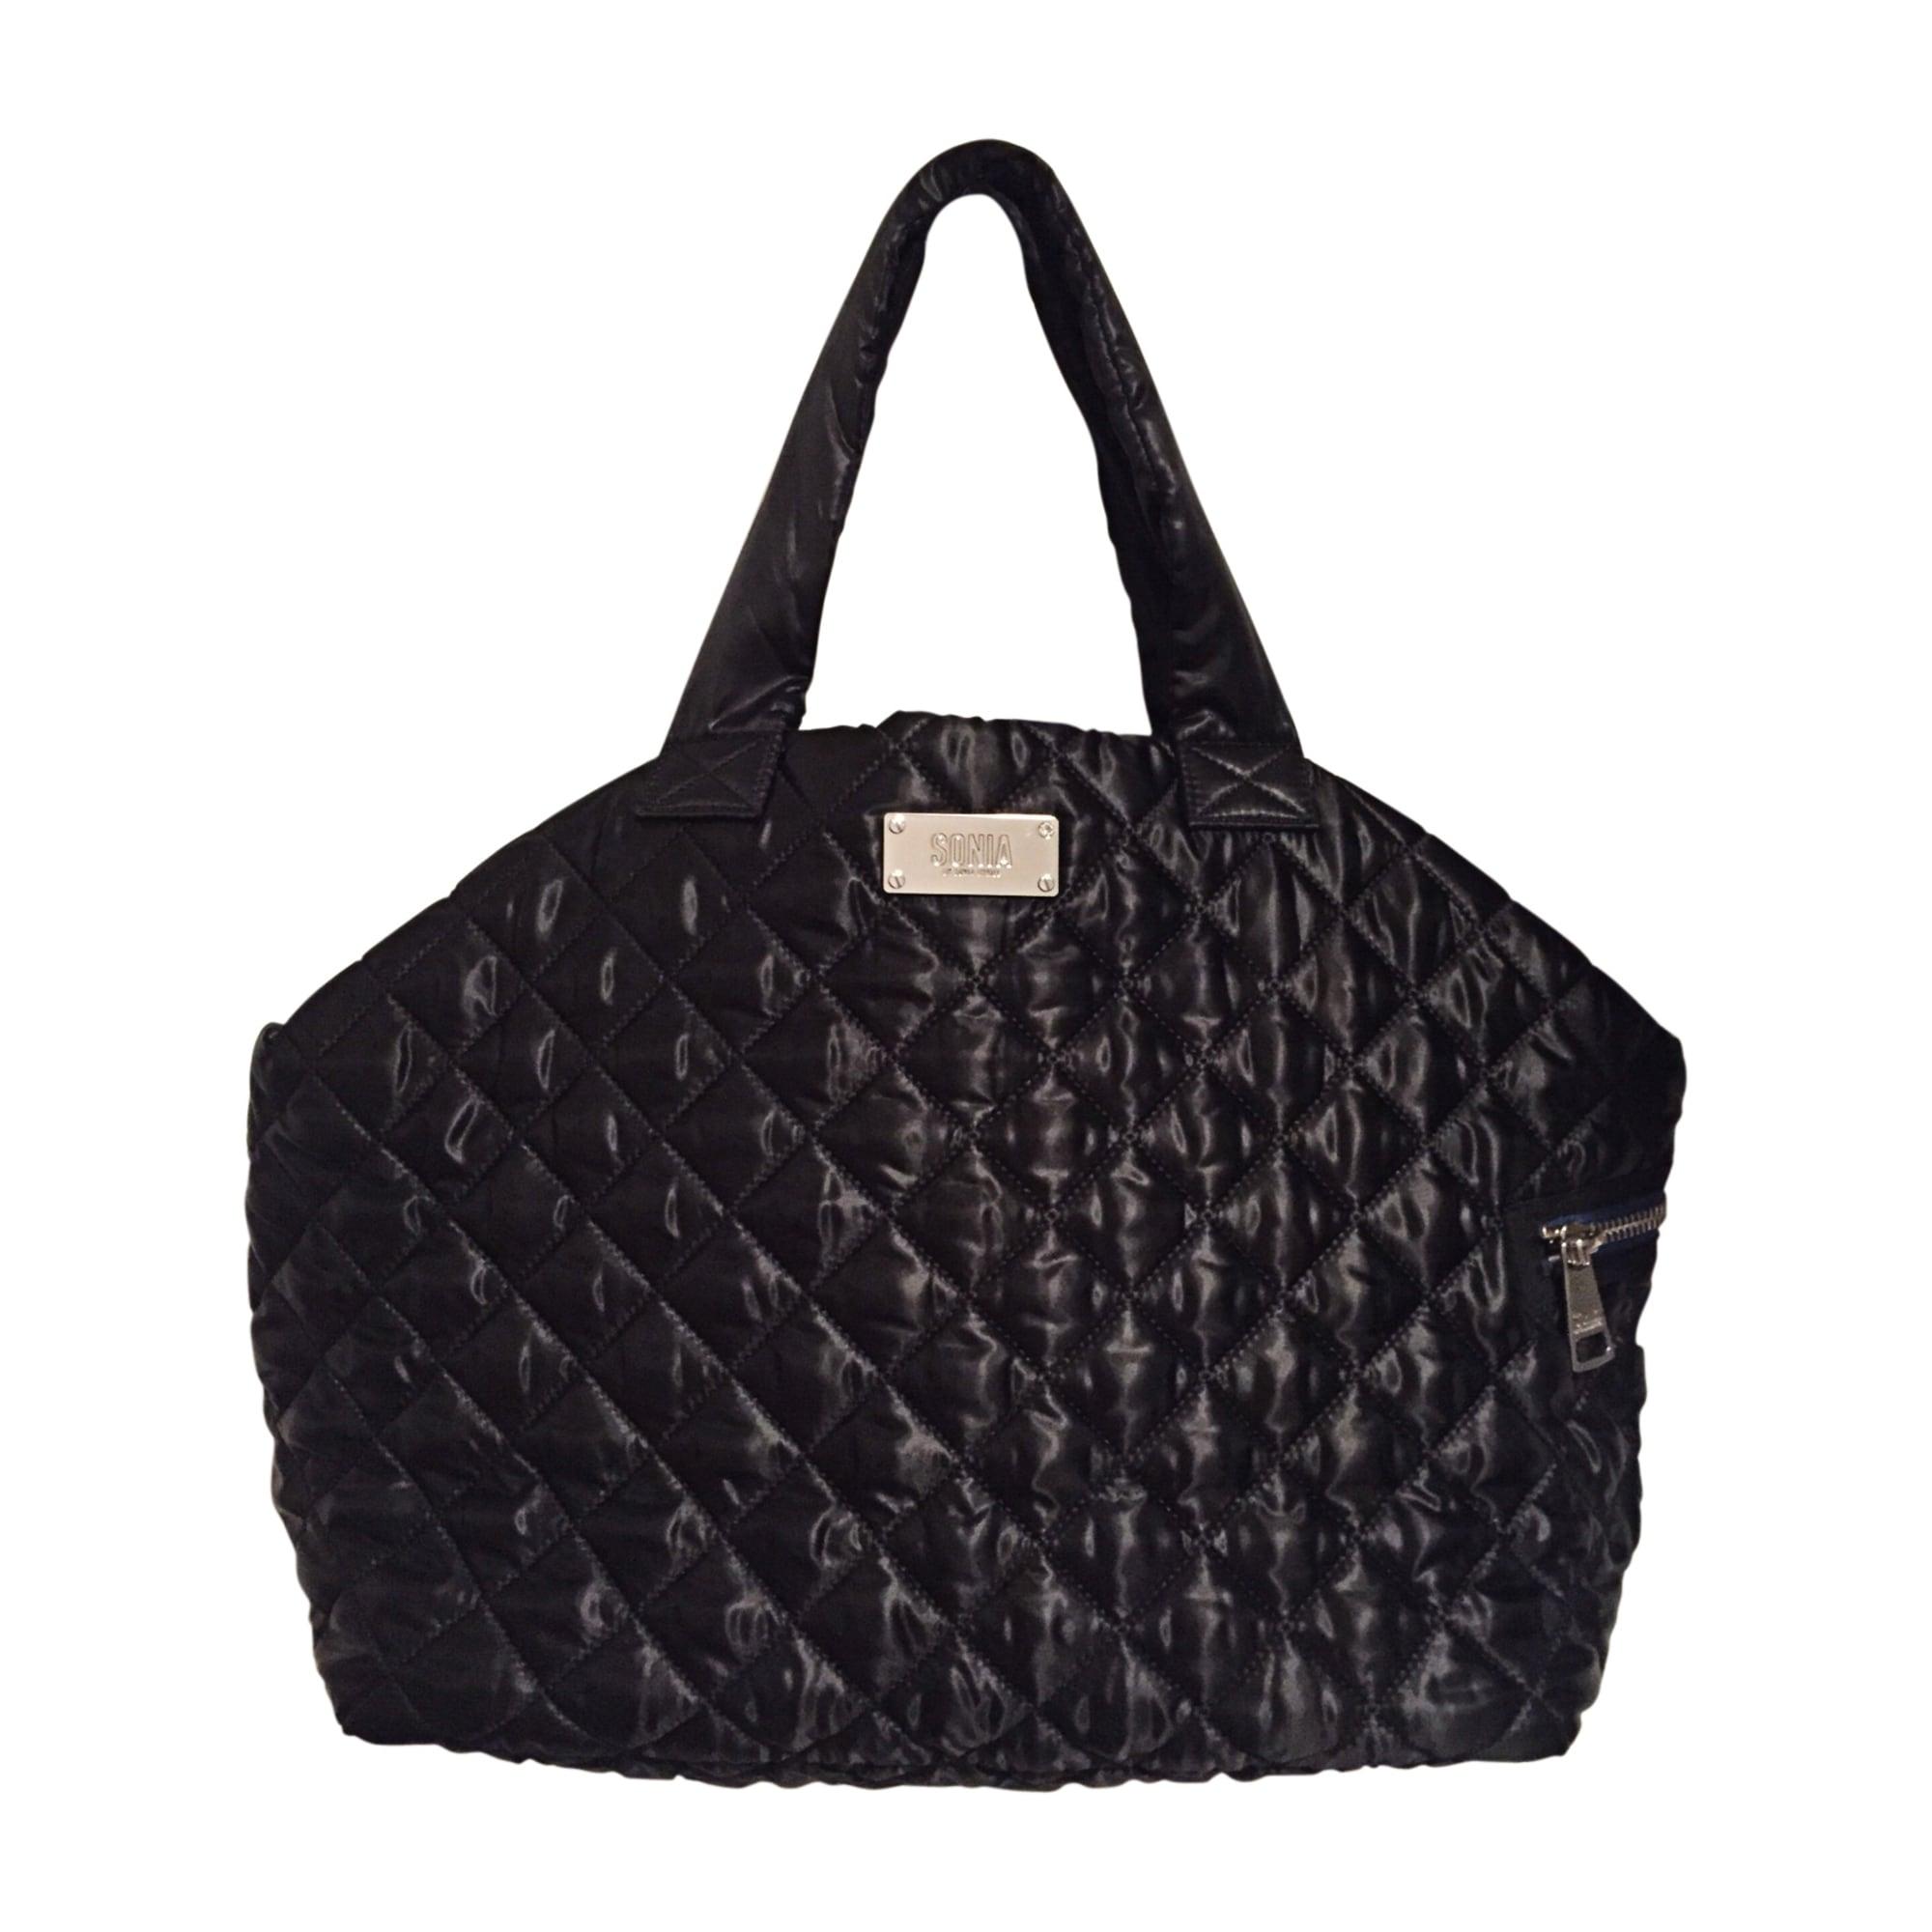 Non-Leather Oversize Bag SONIA RYKIEL Black